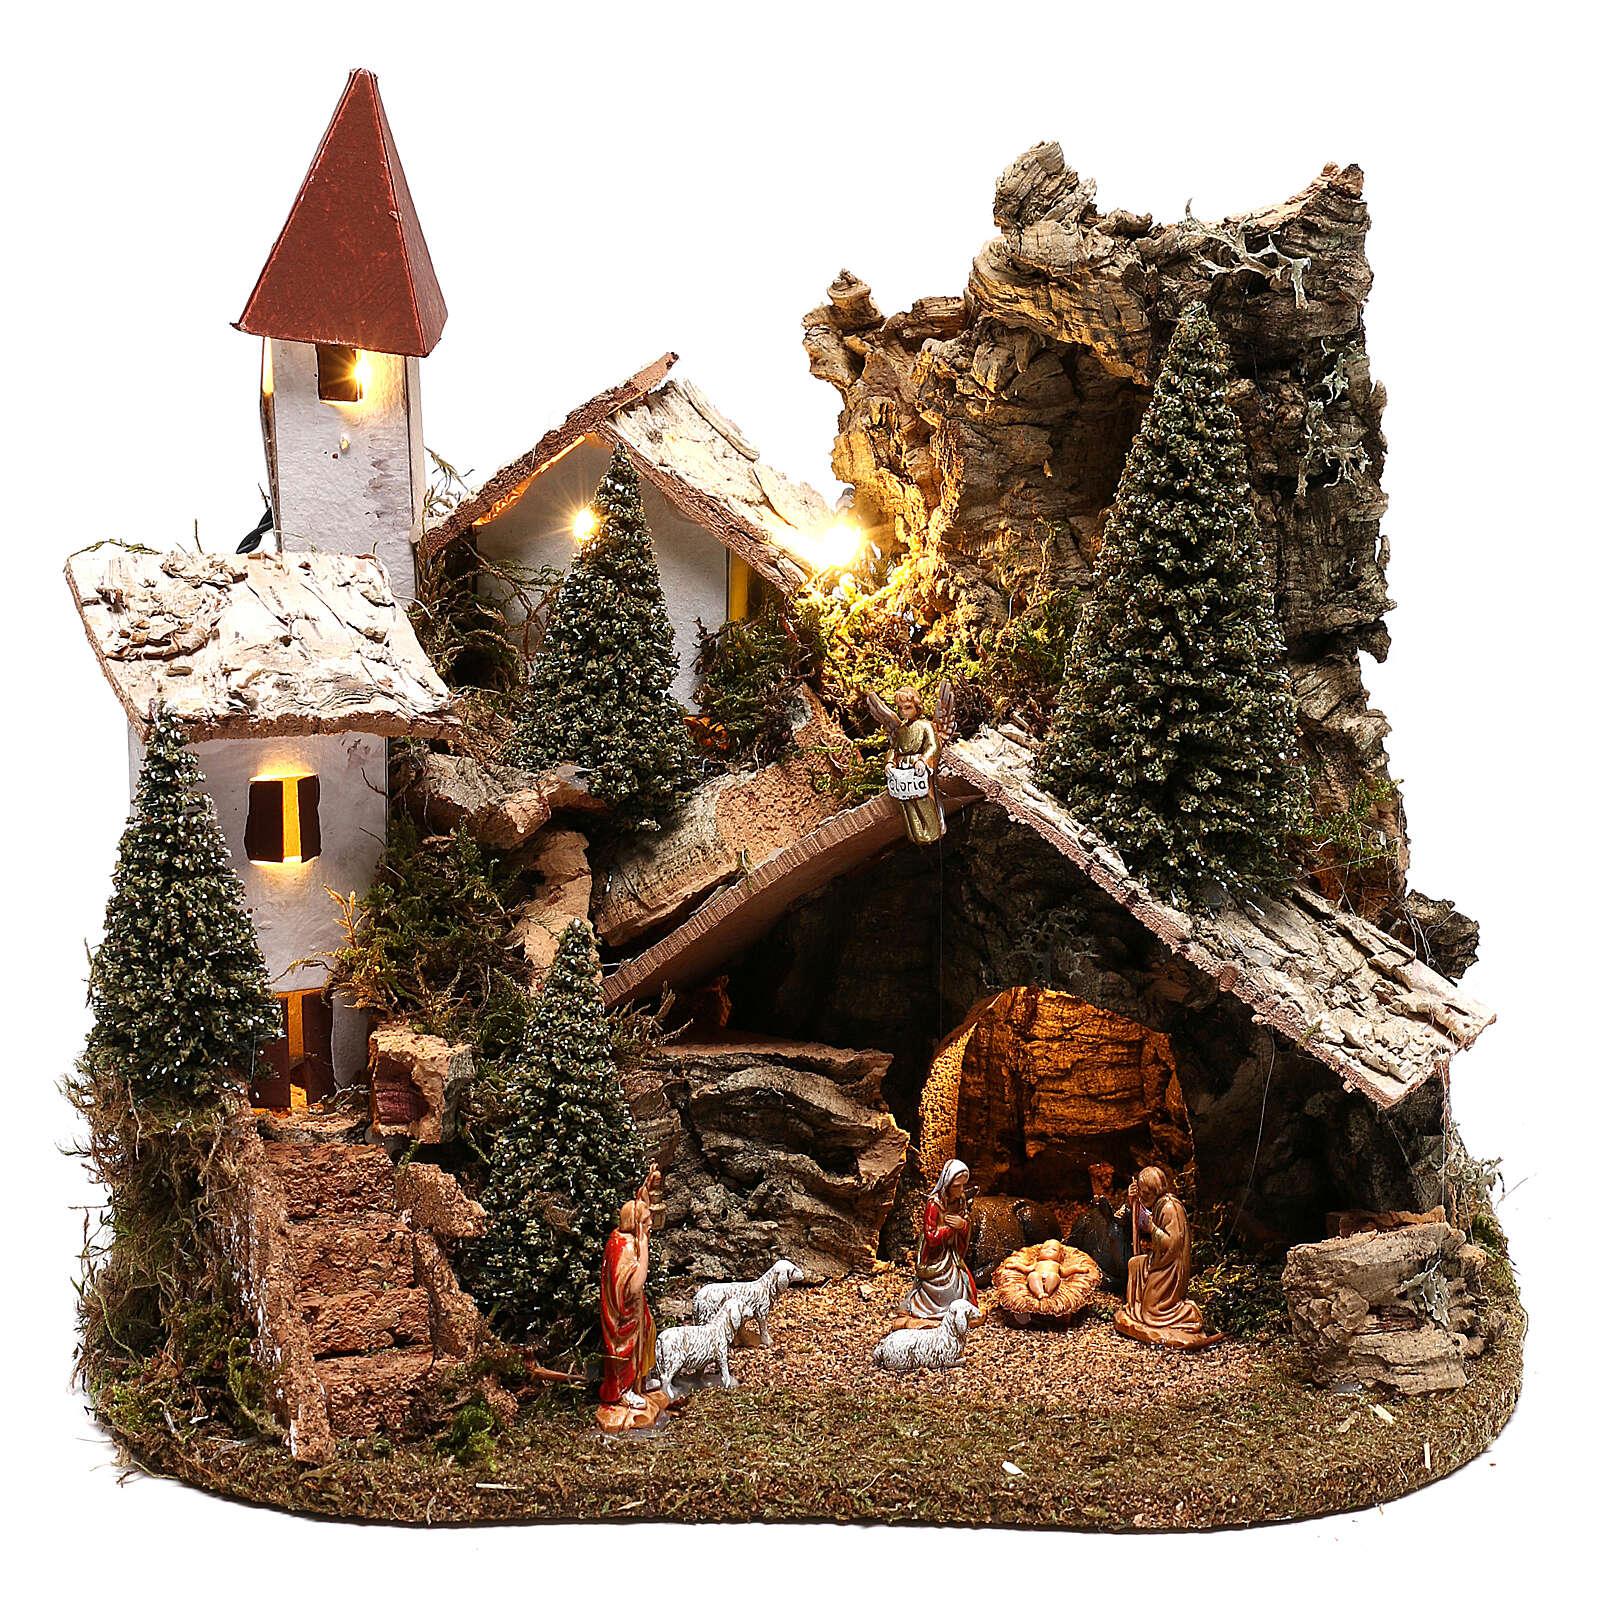 Nativity village with snow 20x25x20 cm, 3-4 cm nativity 4